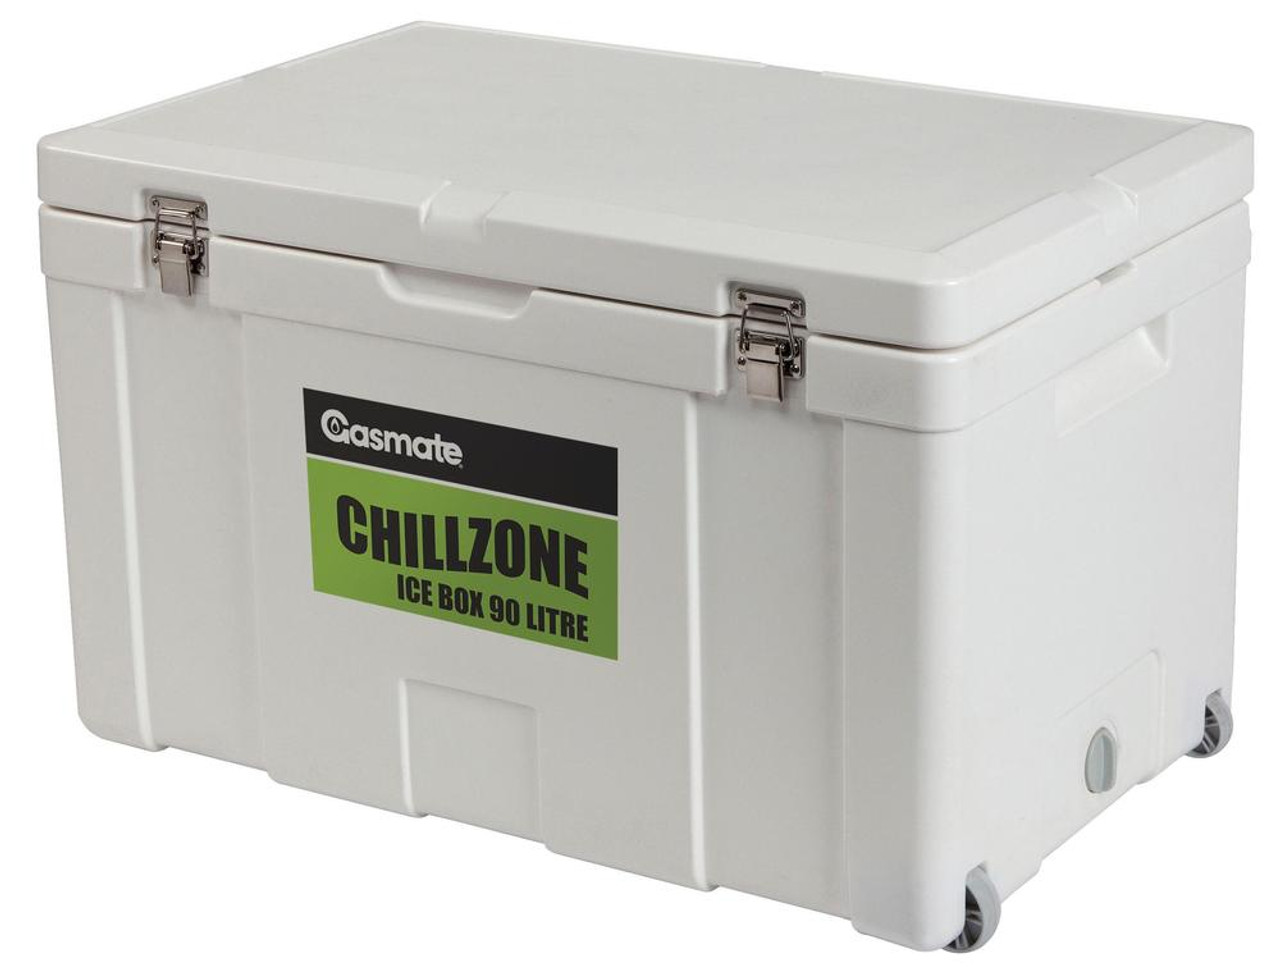 Gasmate Chillzone Ice Box 90 Litre